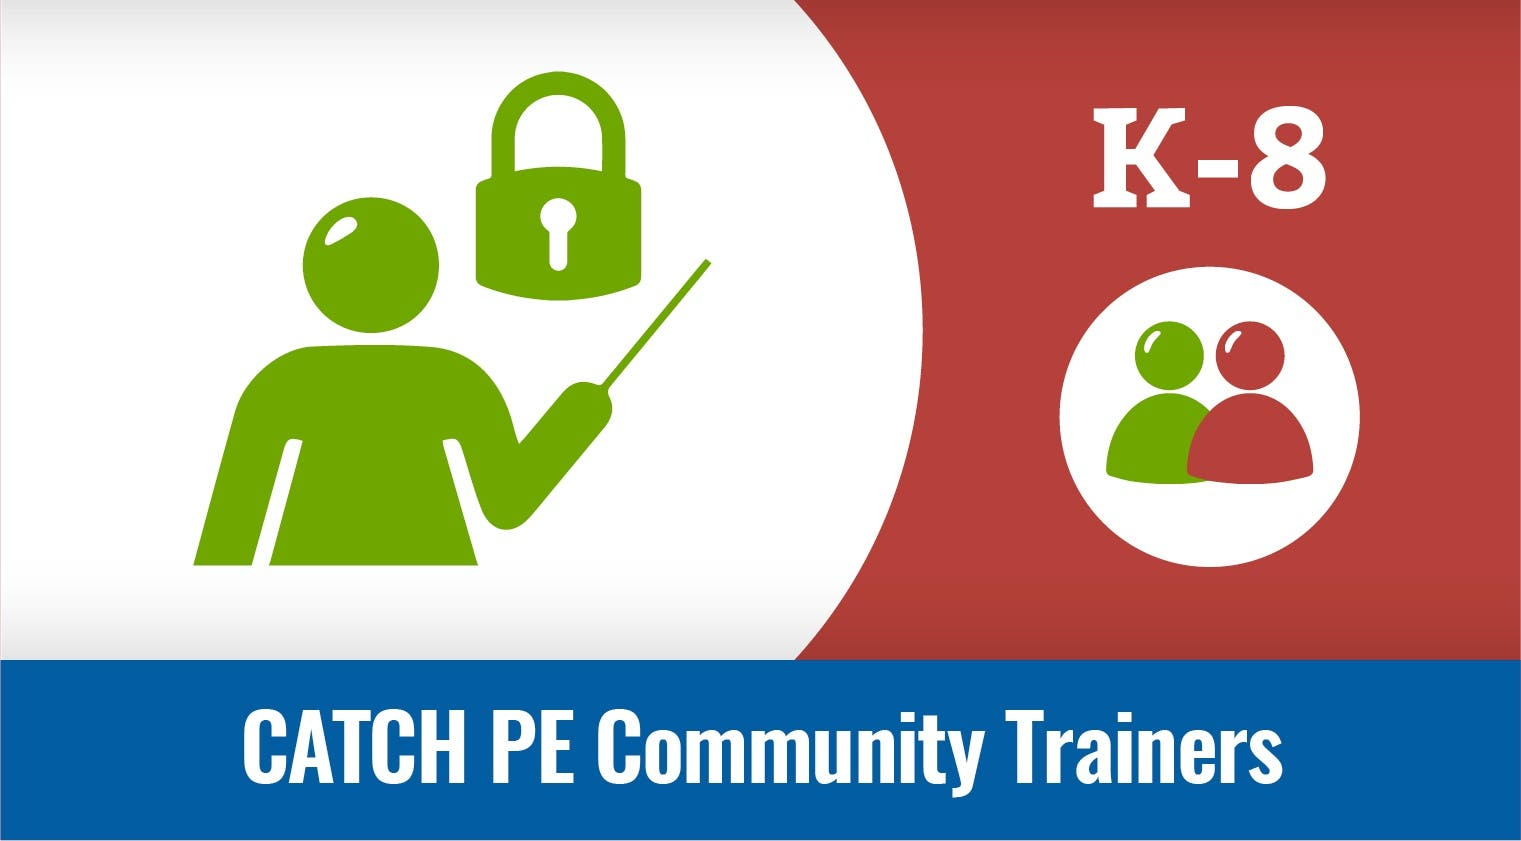 Community Trainers - CATCH P.E.